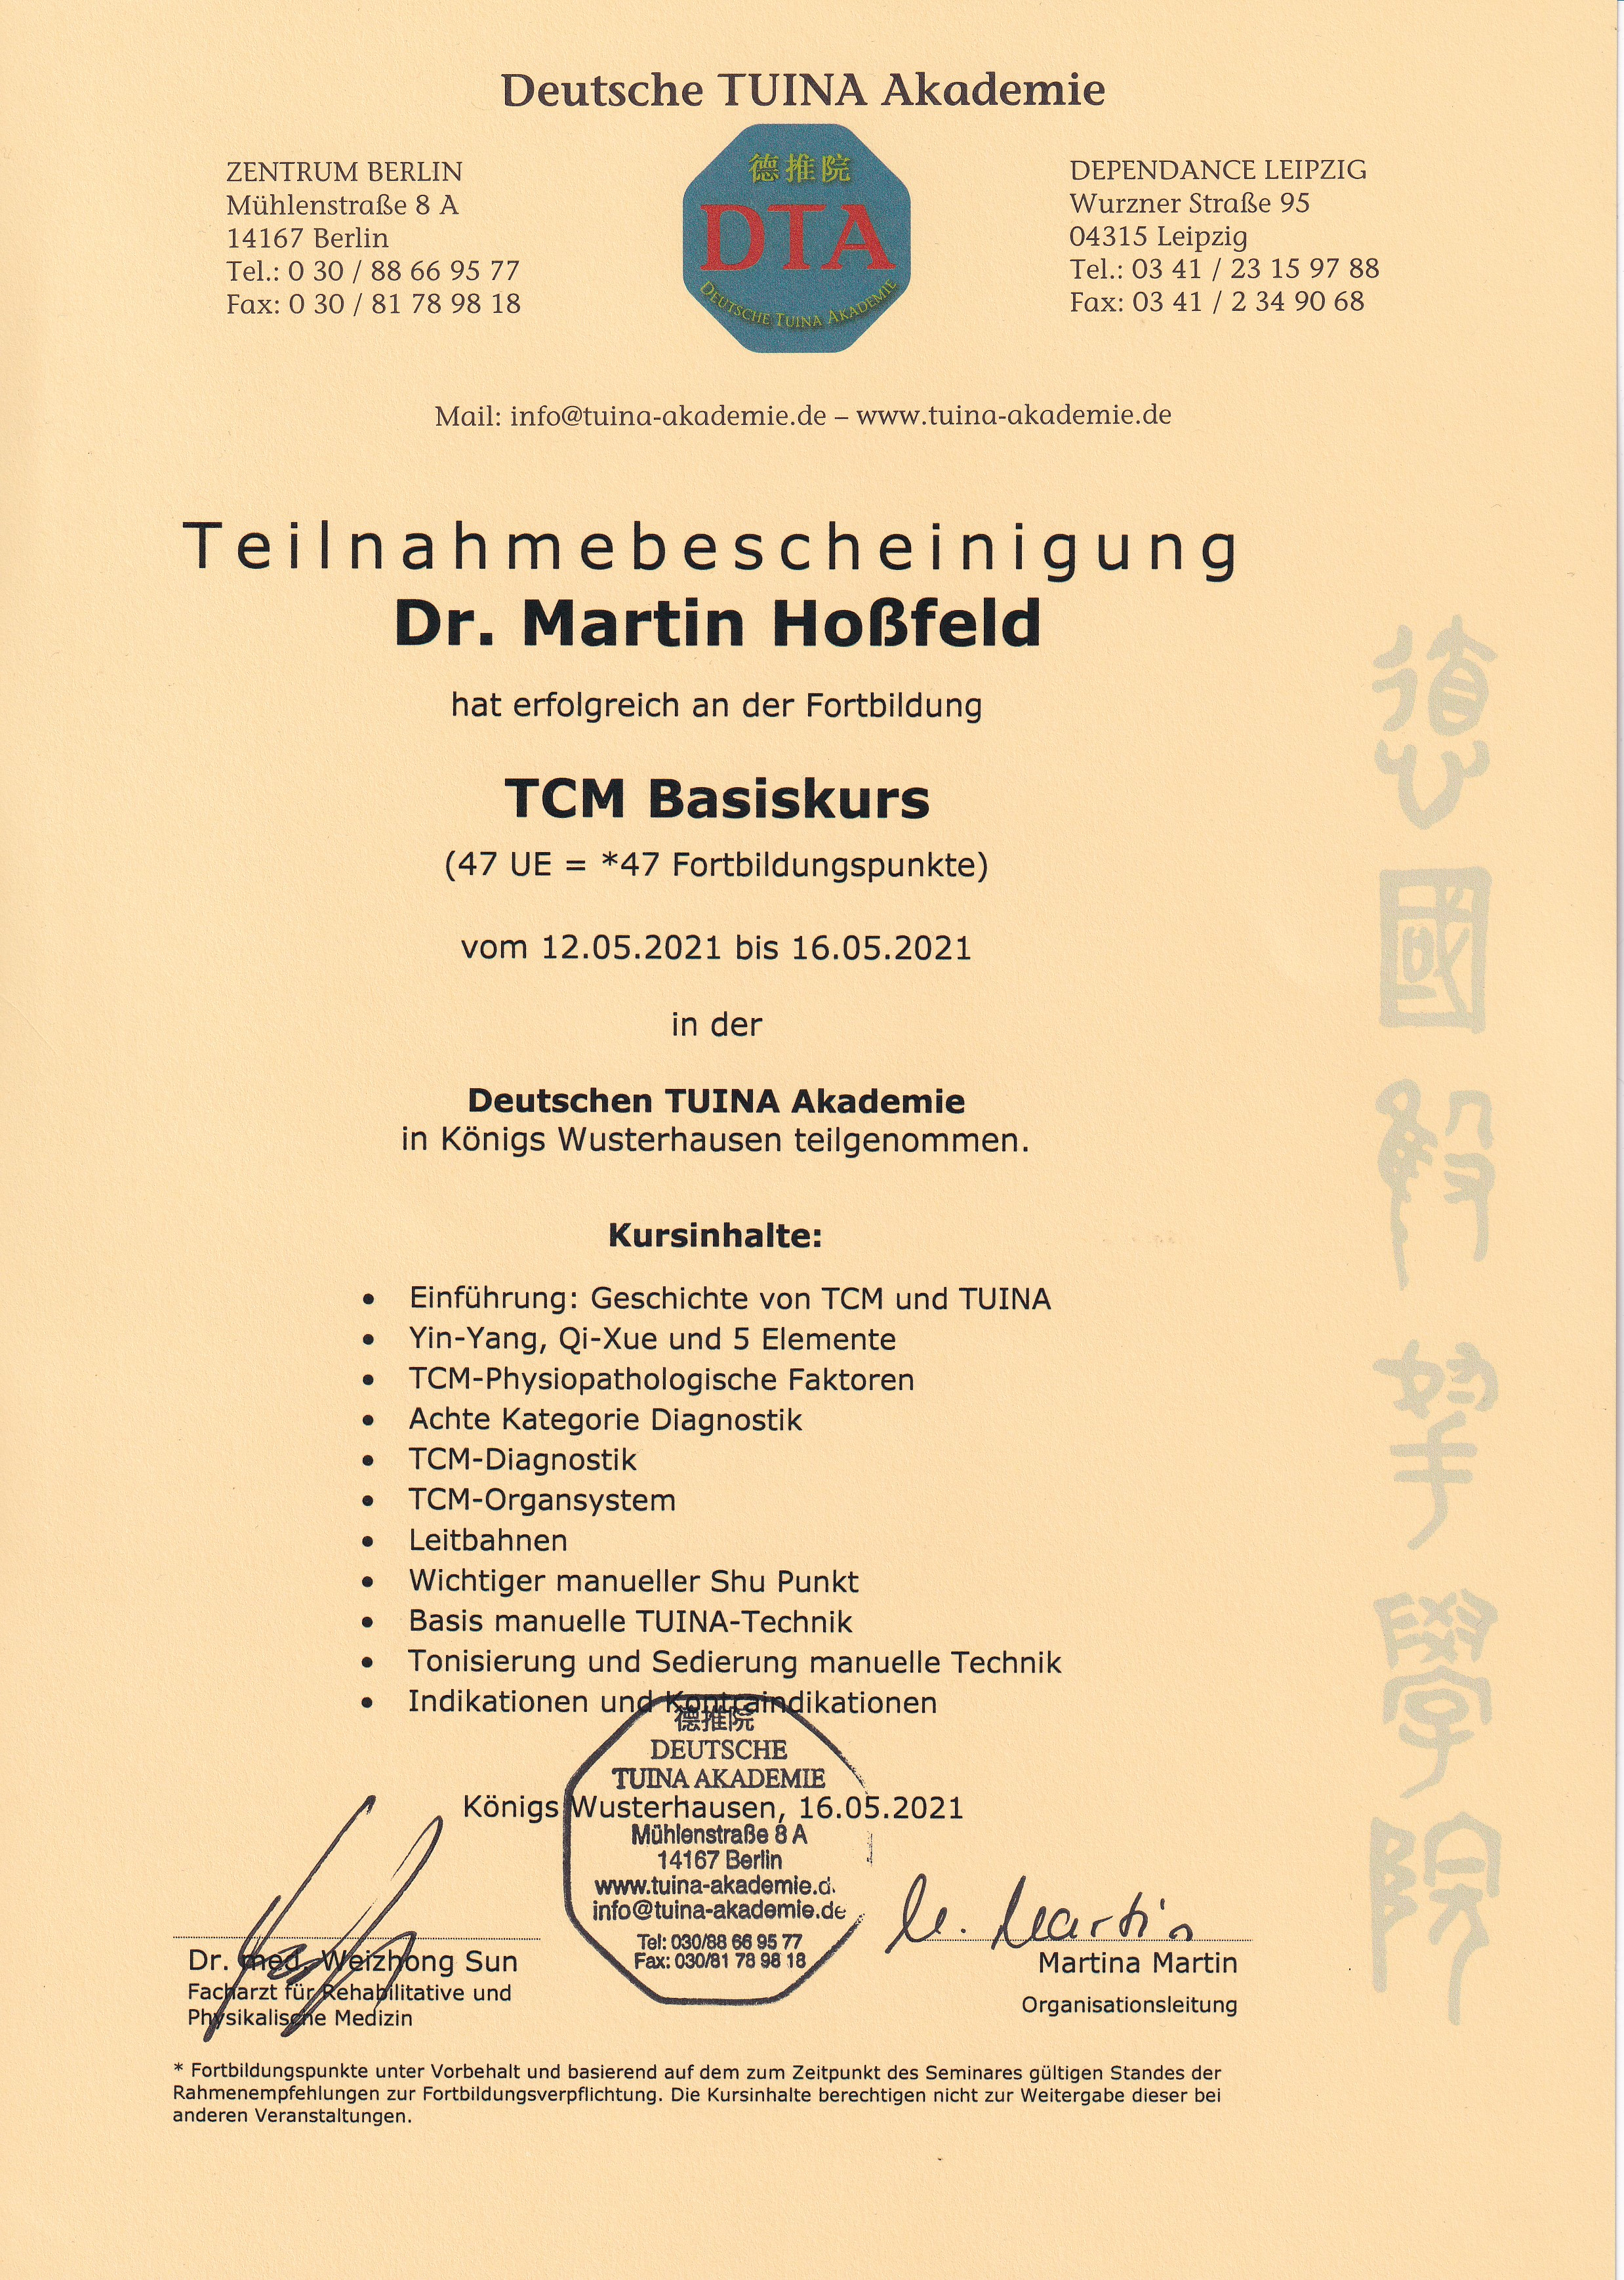 Tuina TCM Basiskurs Zertifikat Martin Hossfeld